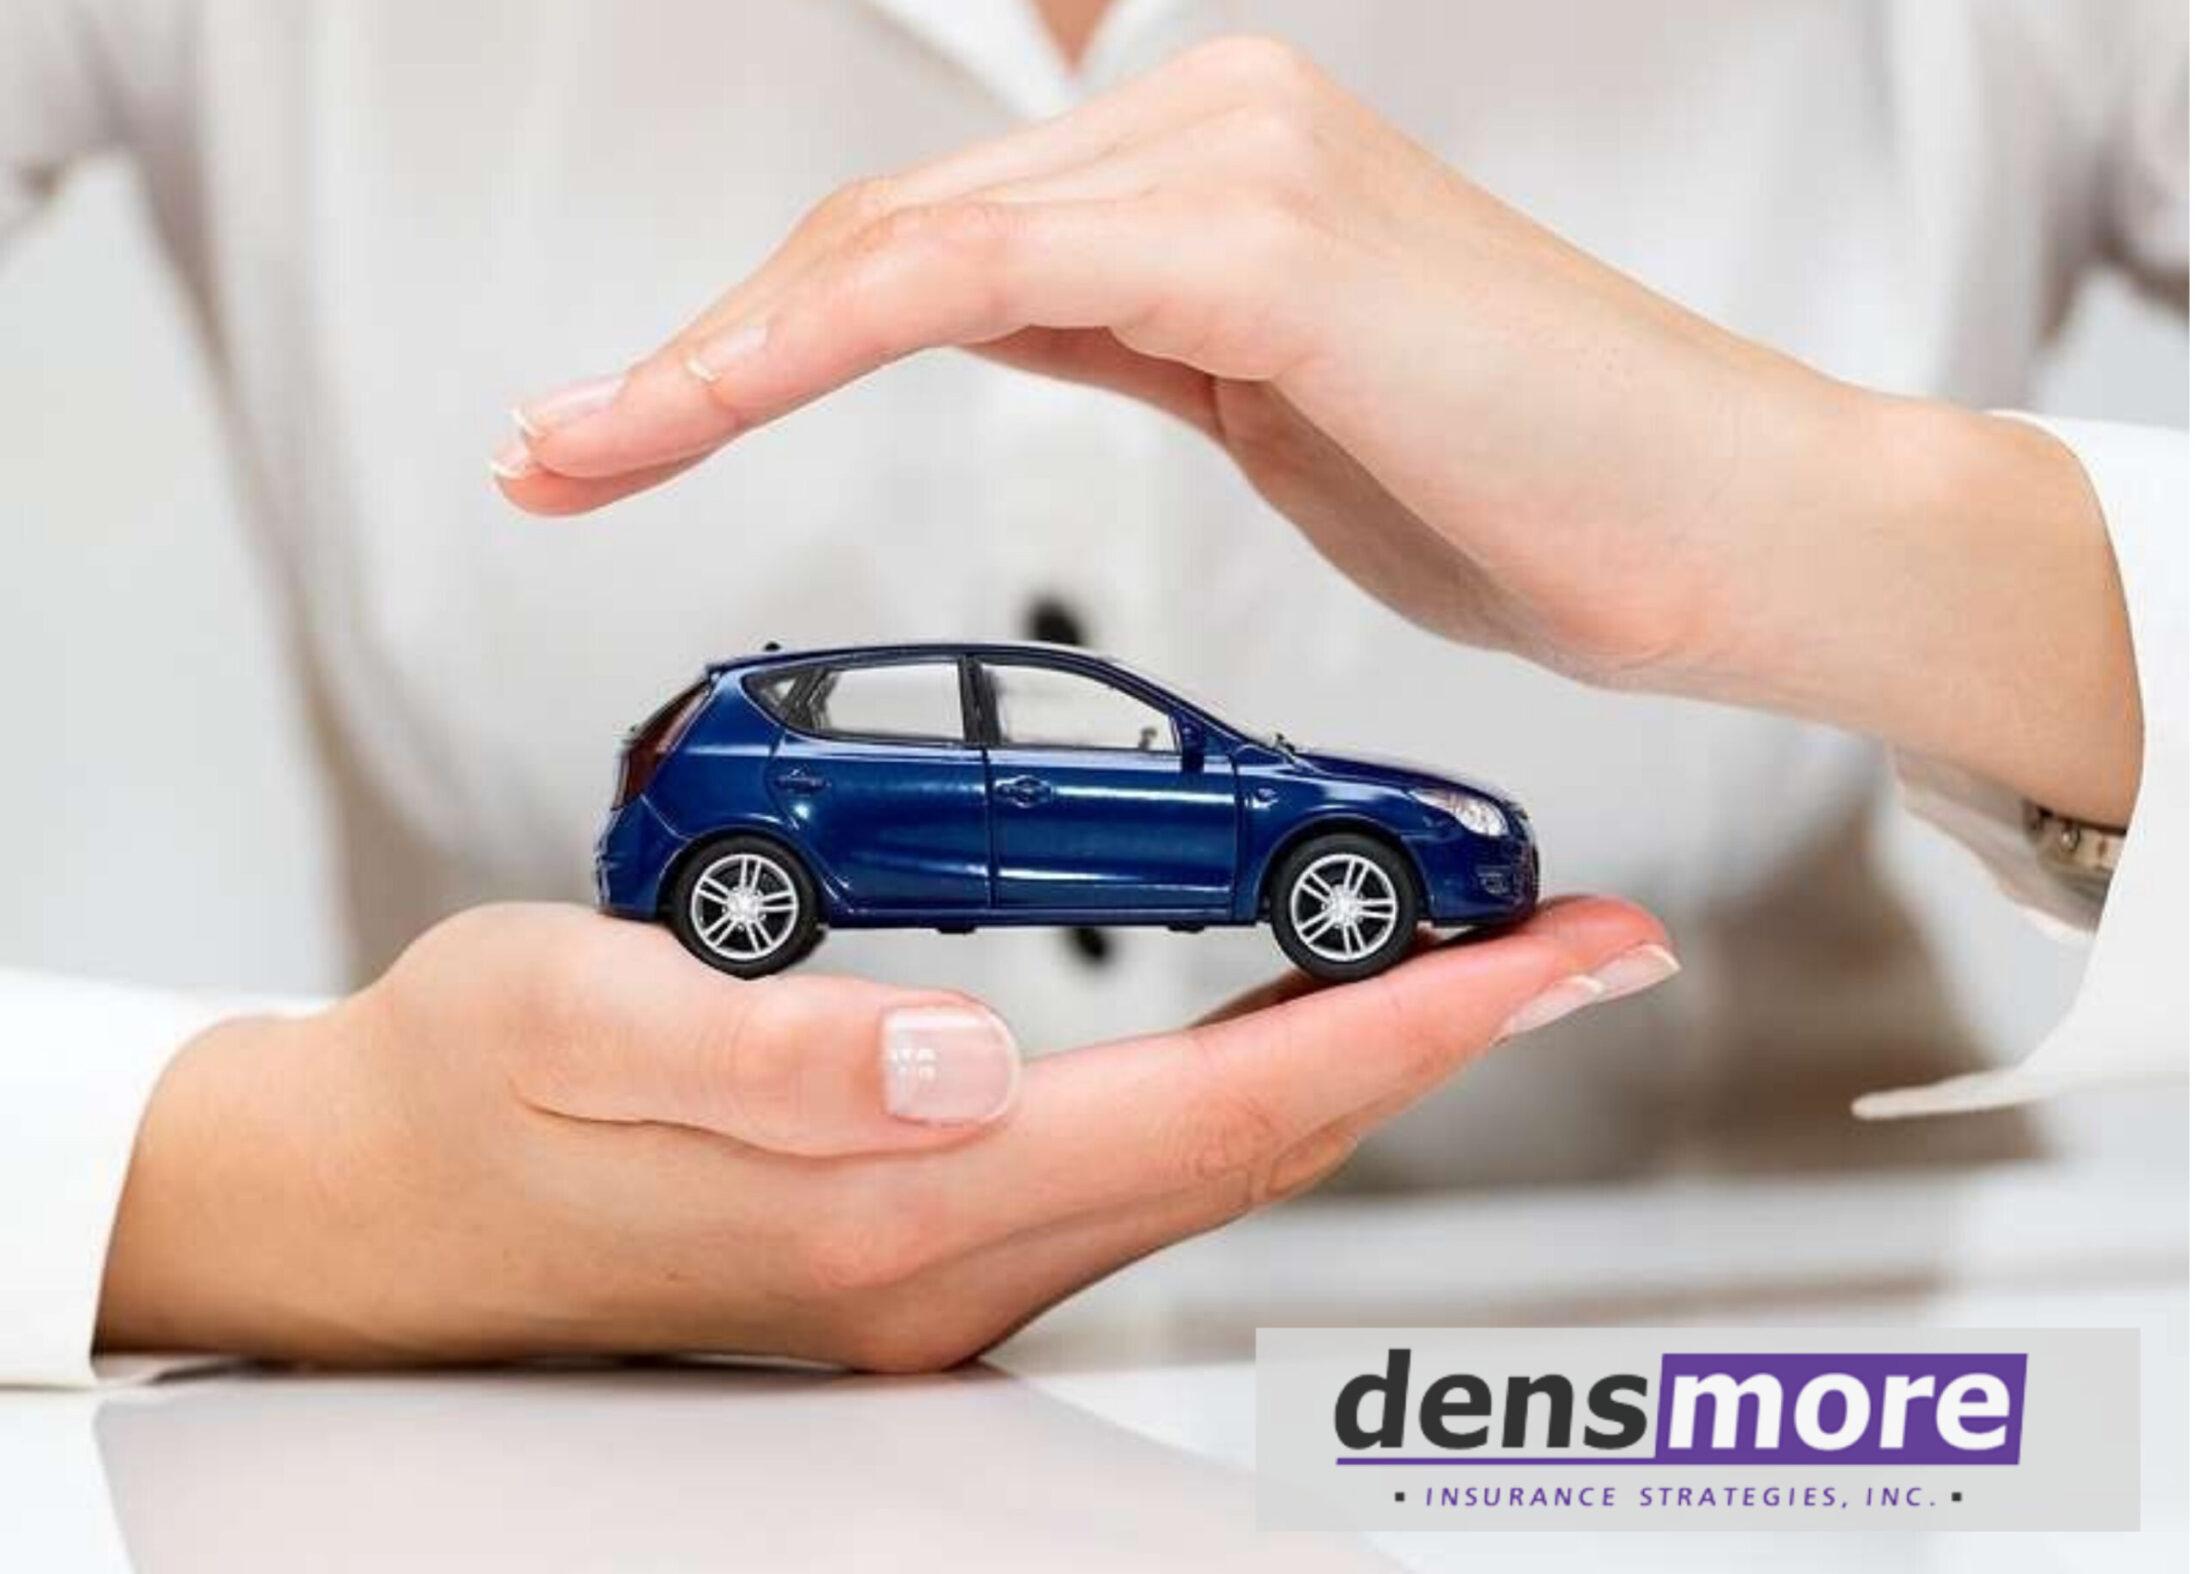 Car Insurance Polk City Iowa Densmore Insurance Strategies Inc scaled e1599024627318